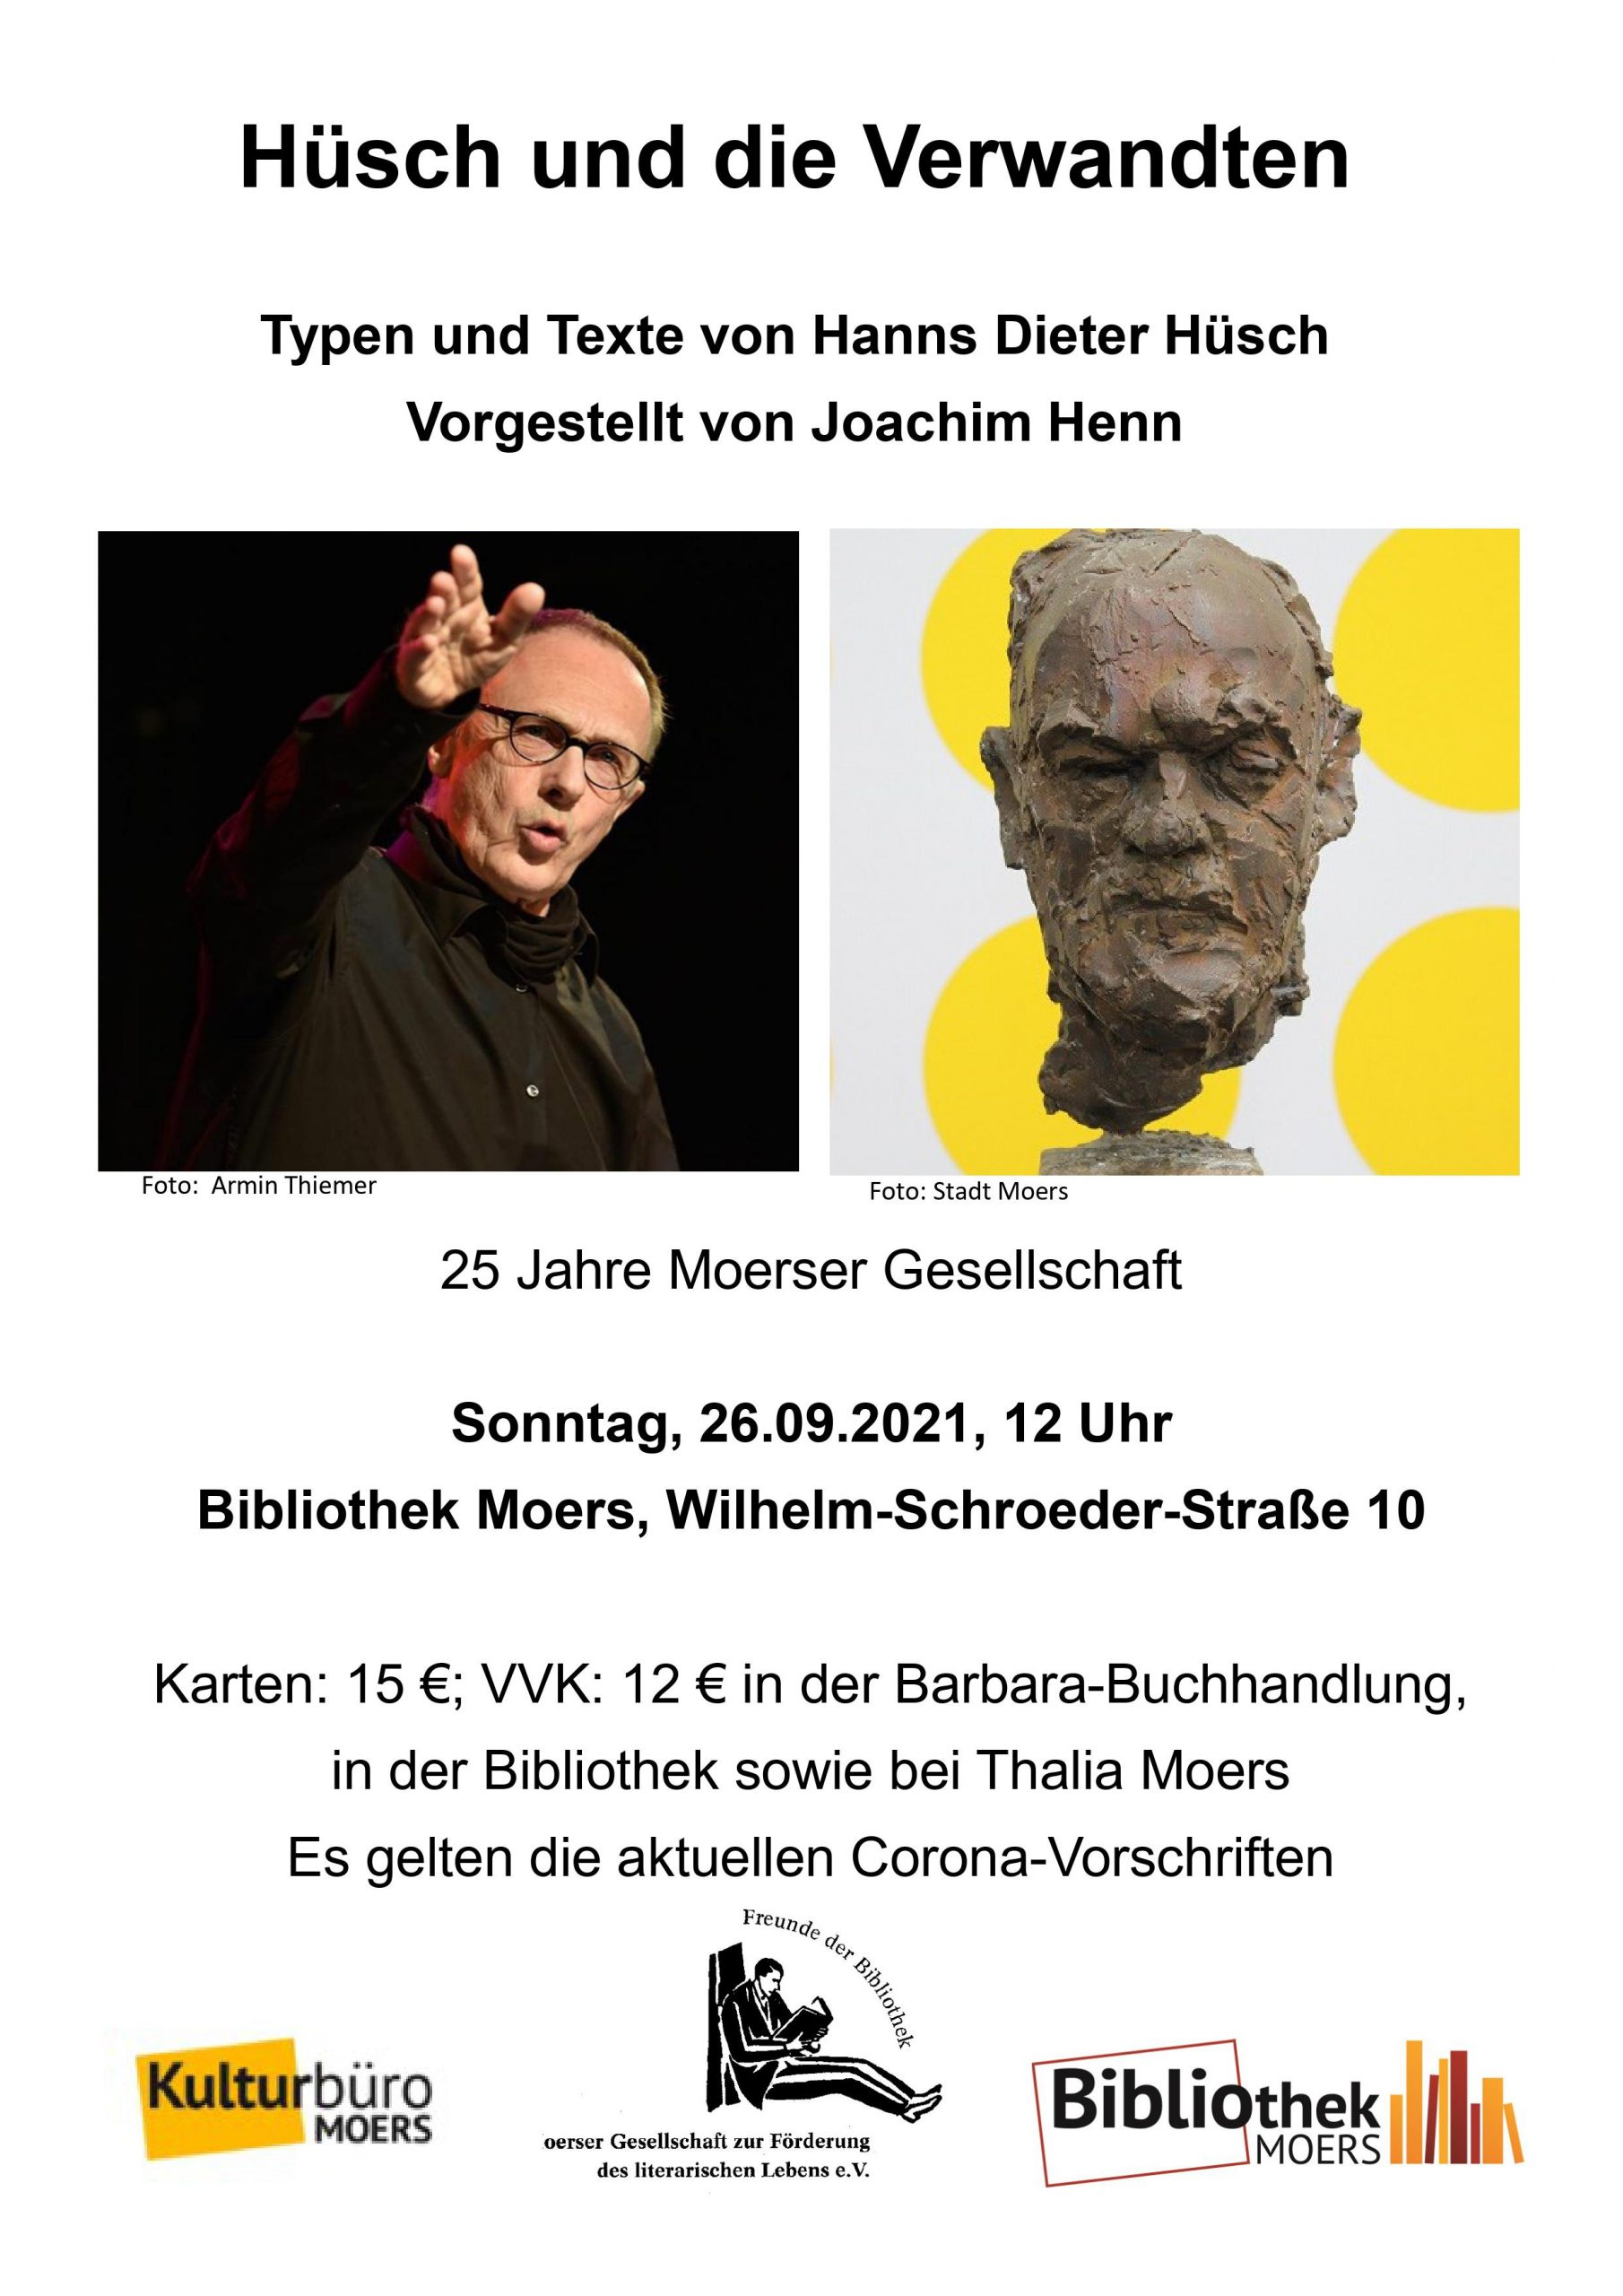 Jubiläum 25 Jahre Moerser Gesellschaft, Lesung mit Joachim Henn